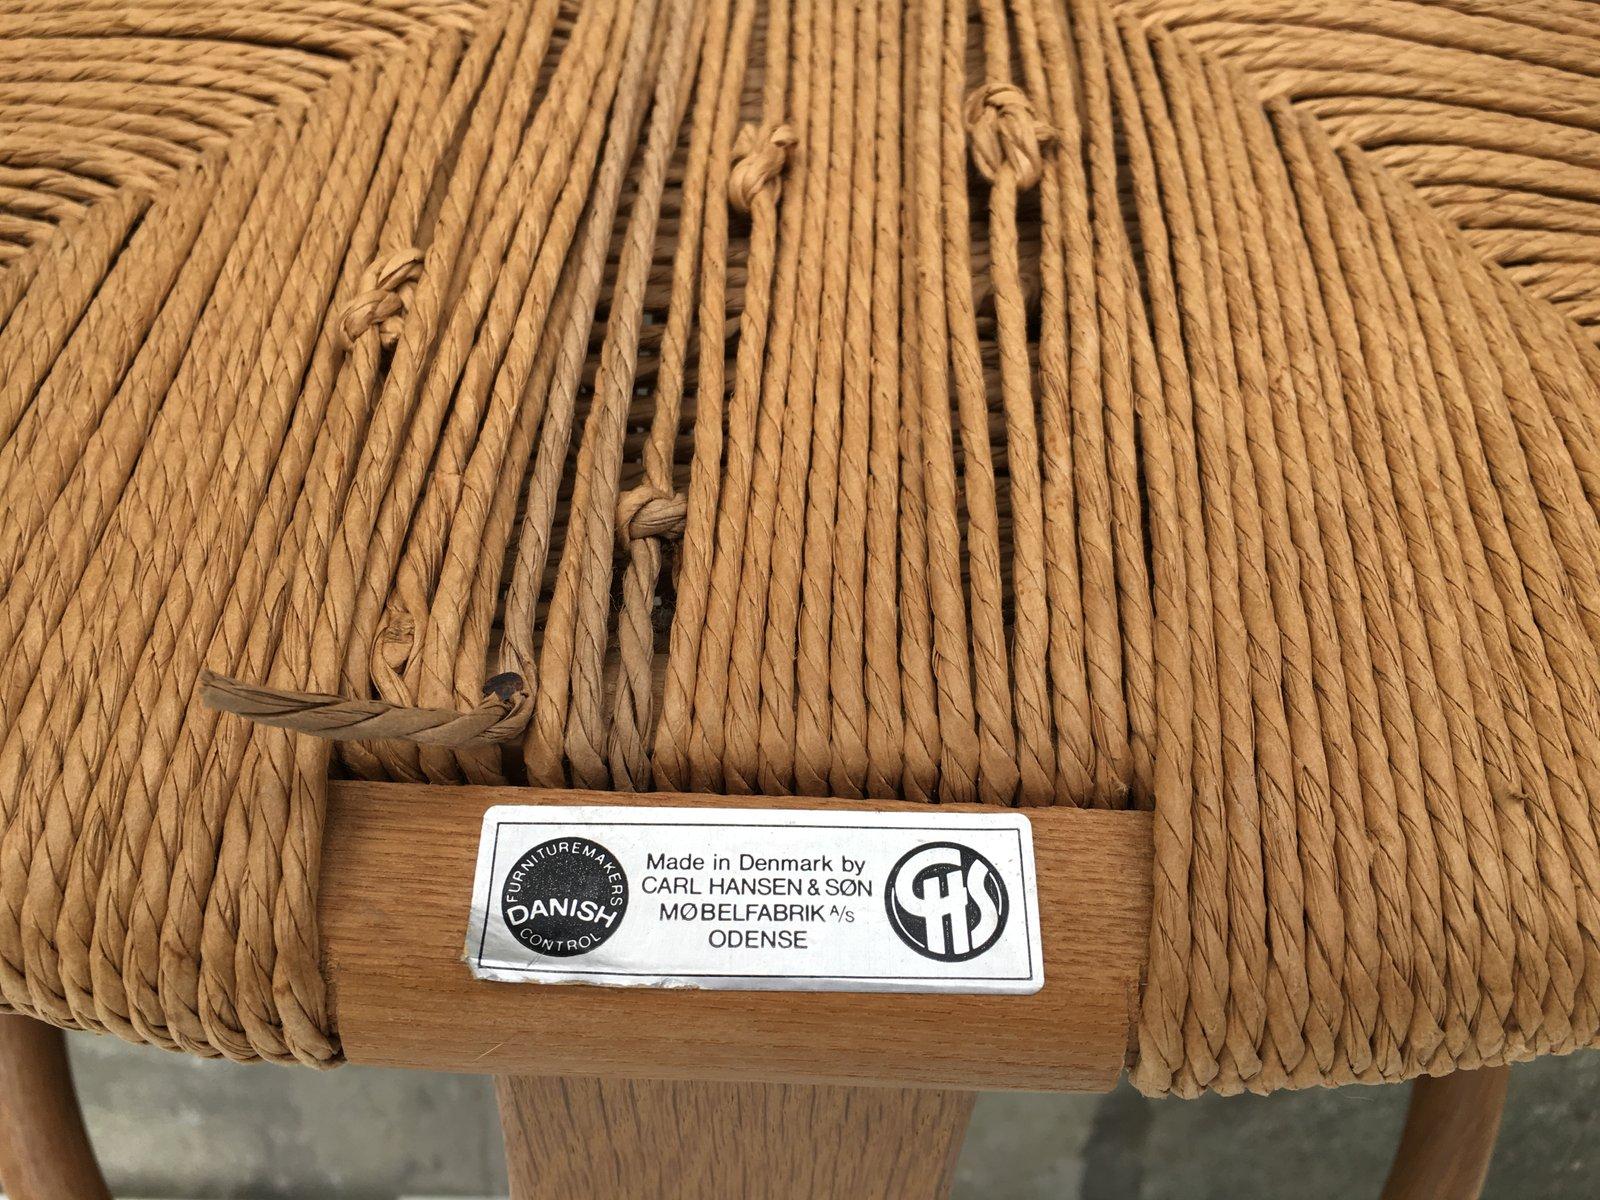 CH24 Y Wishbone Chairs by Hans Wegner for Carl Hansen & S¸n 1950s